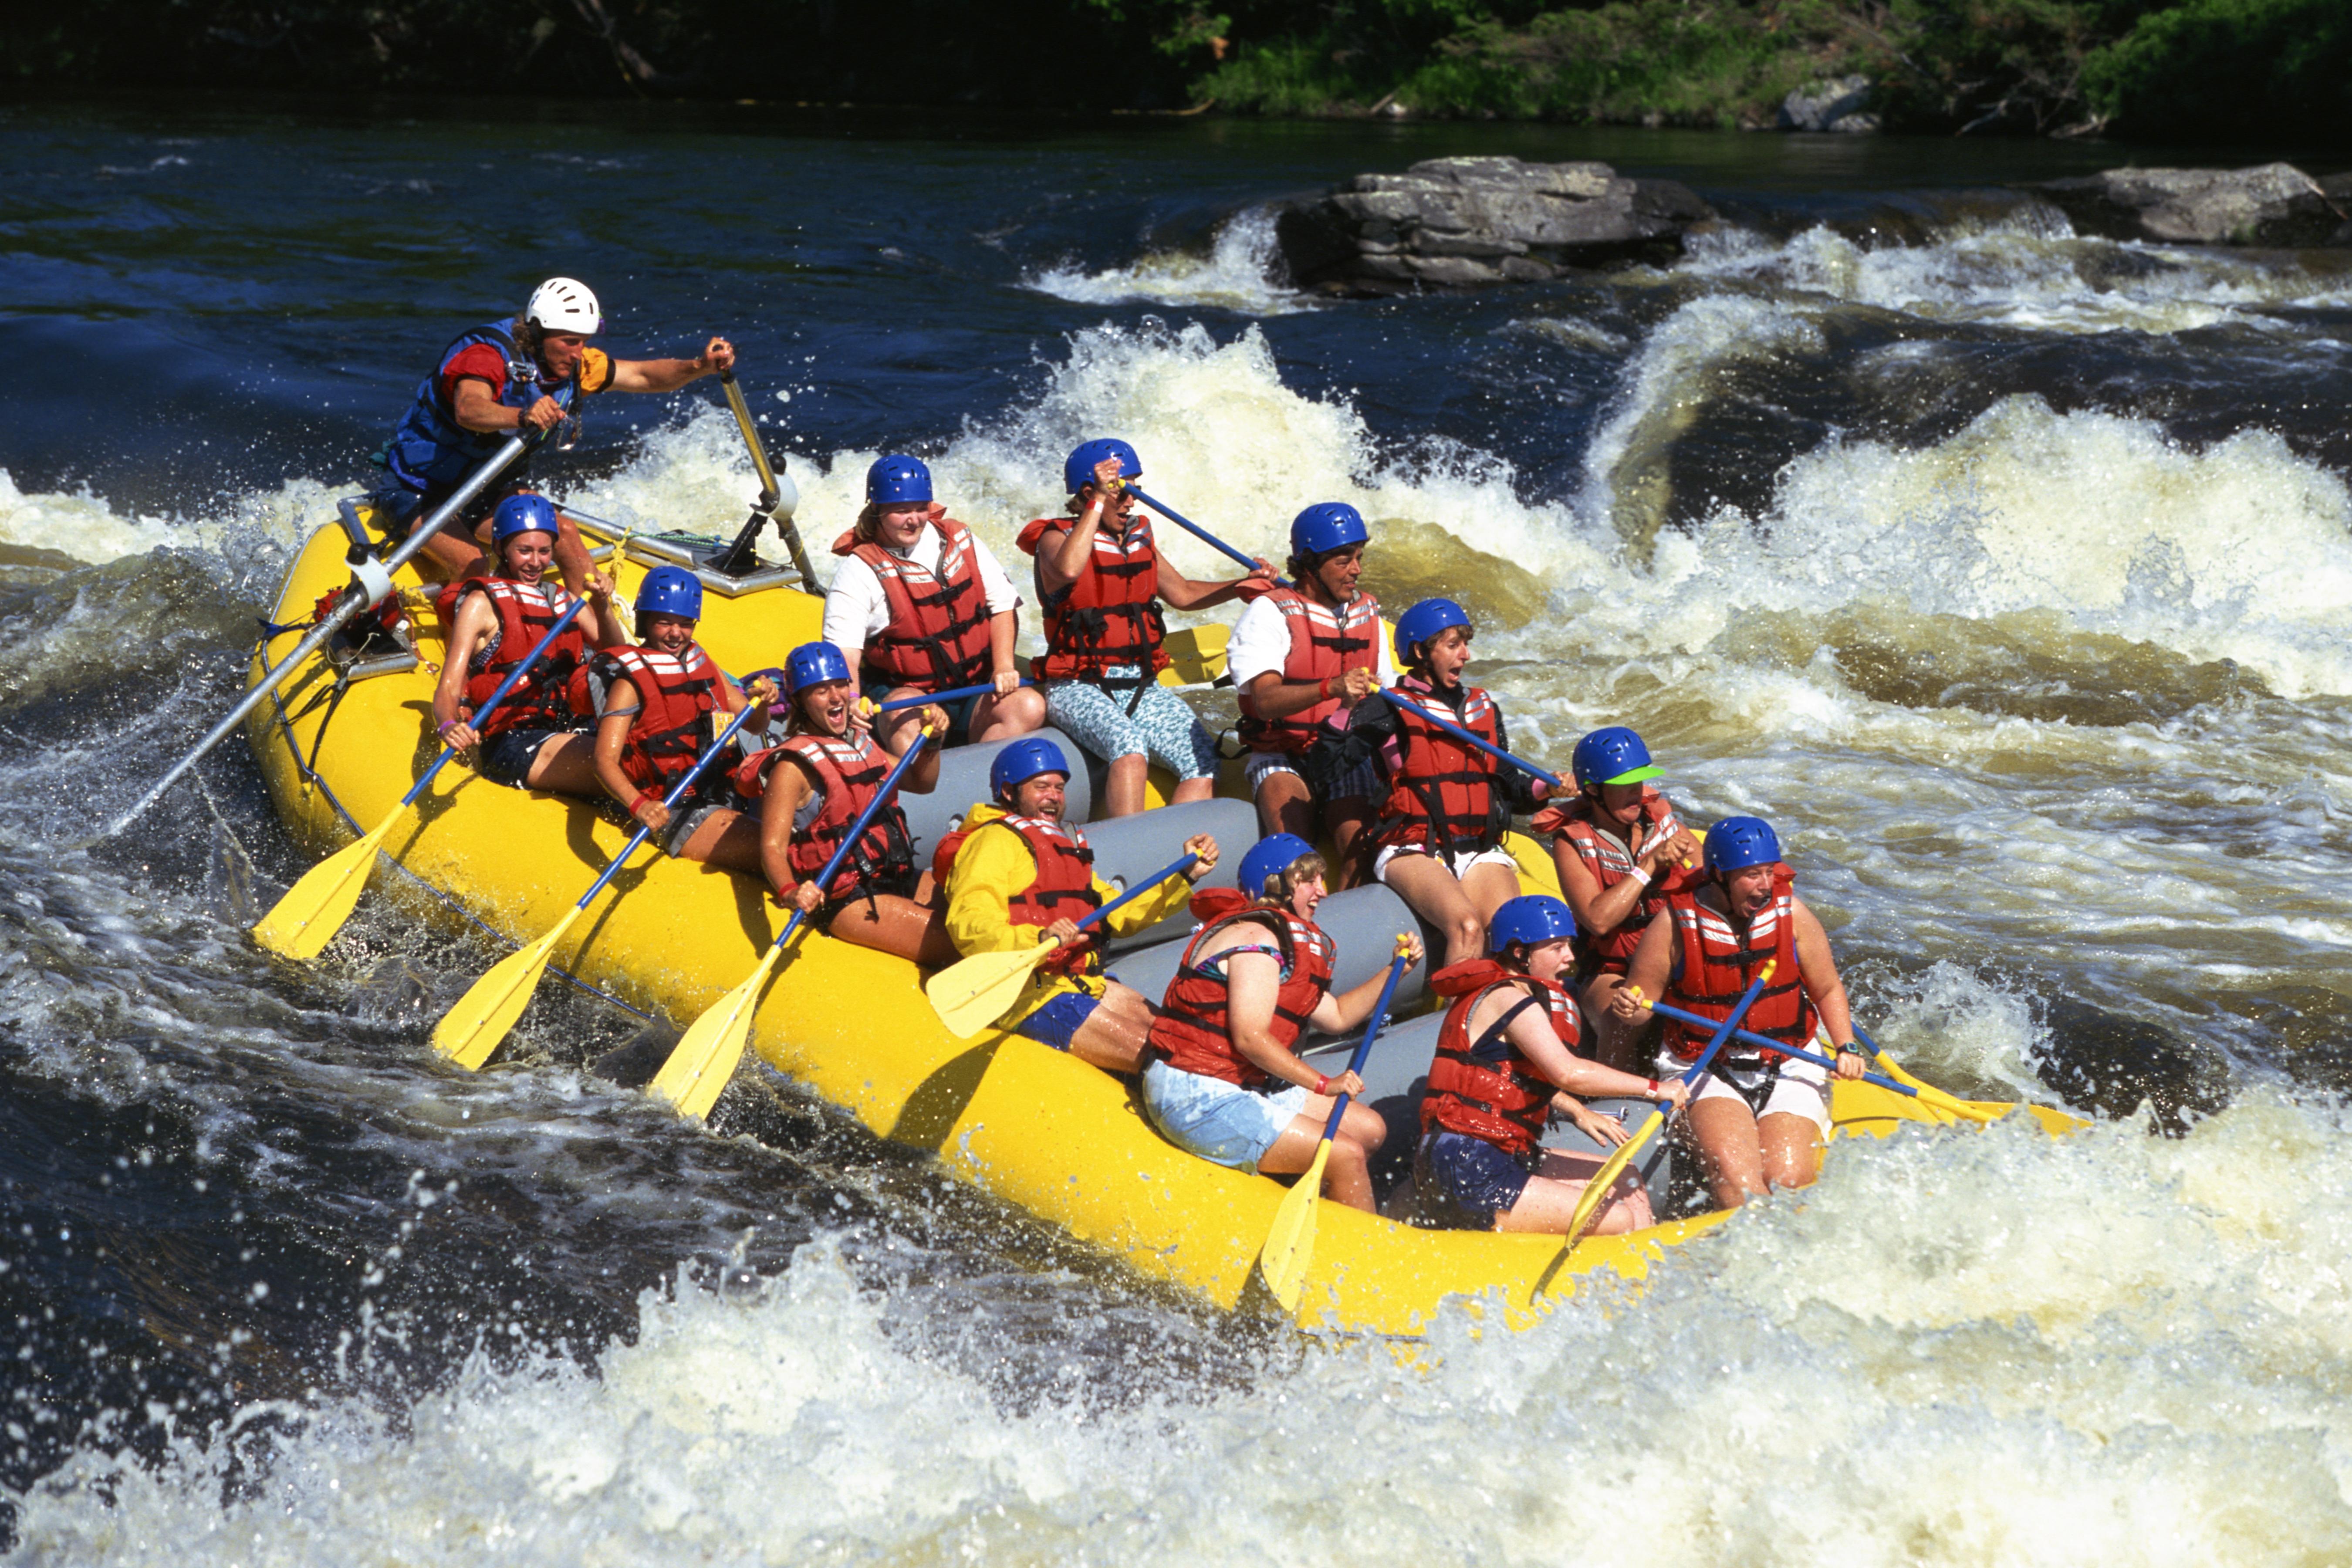 White water rafting, Ottawa River, Ontario